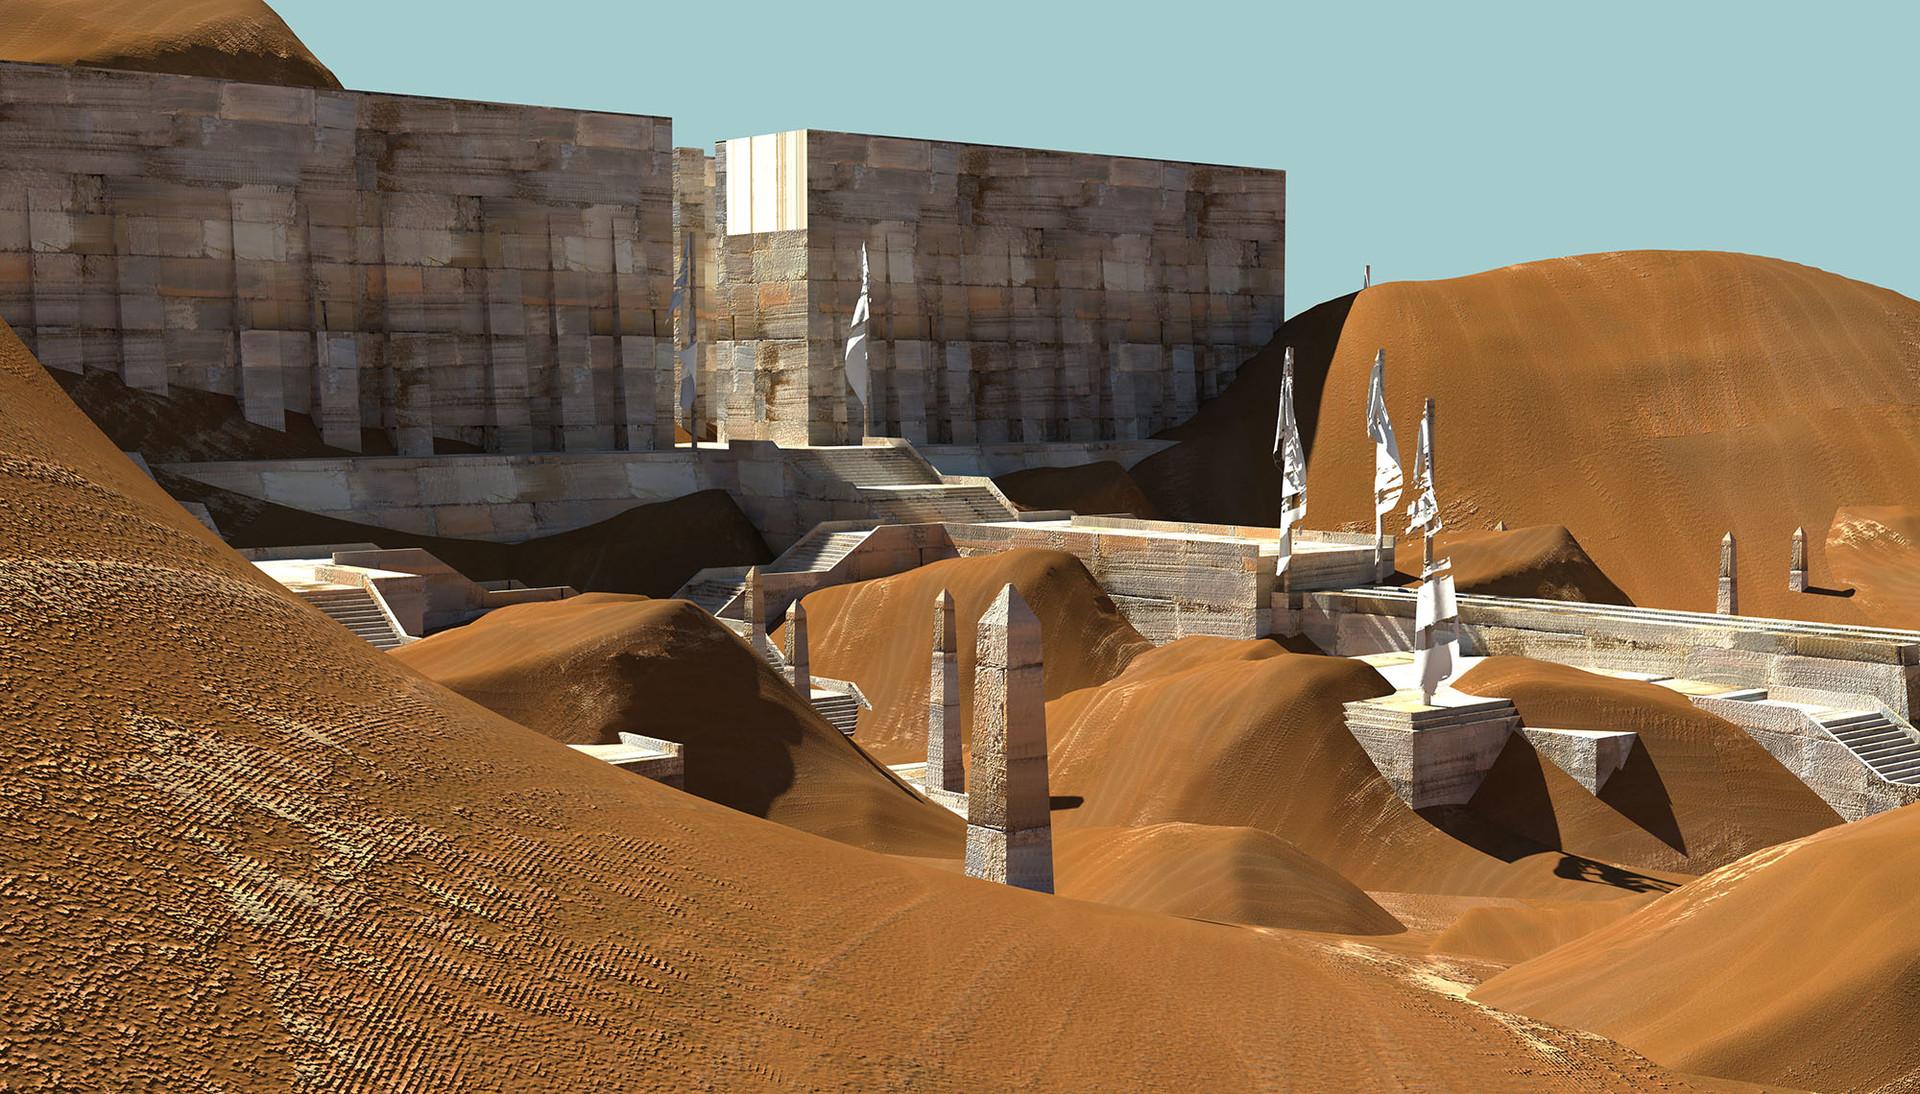 Jason cumbers sand temple 3dblock